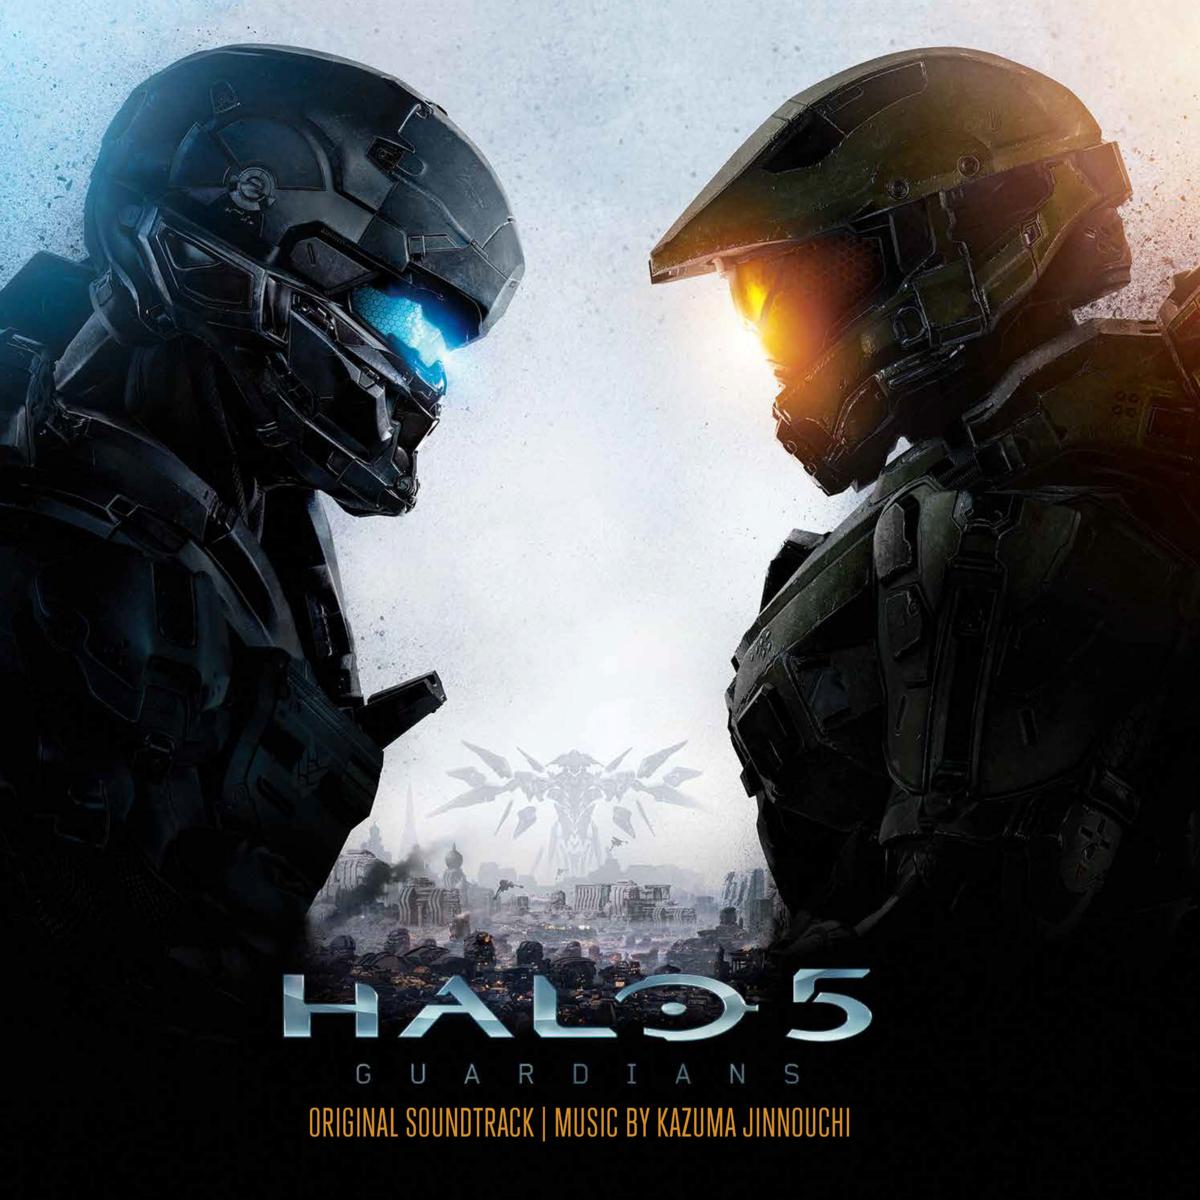 Halo 5: Guardians Original Soundtrack - Halopedia, the Halo